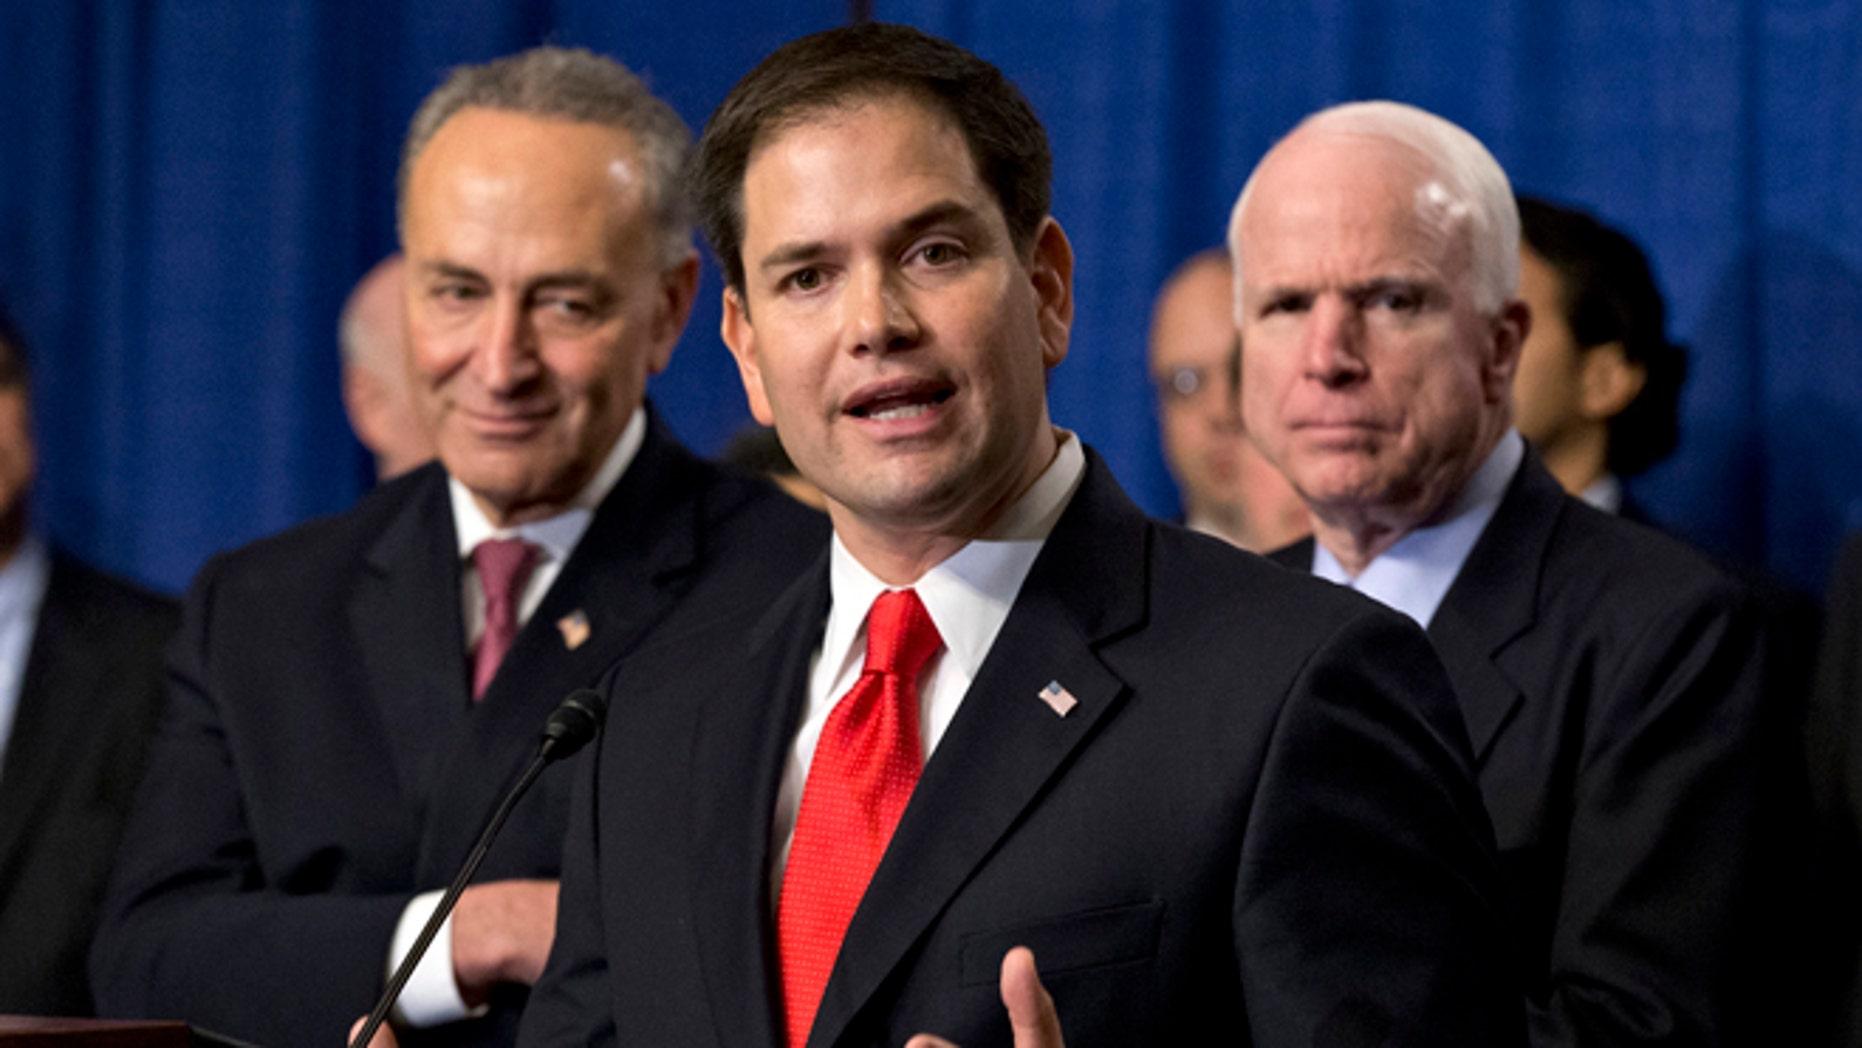 April 18, 2013: Sen. Marco Rubio, R-Fla., flanked by Sen. Charles Schumer, D-N.Y., left, and Sen. John McCain, R-Ariz., right, speaks about immigration legislation.